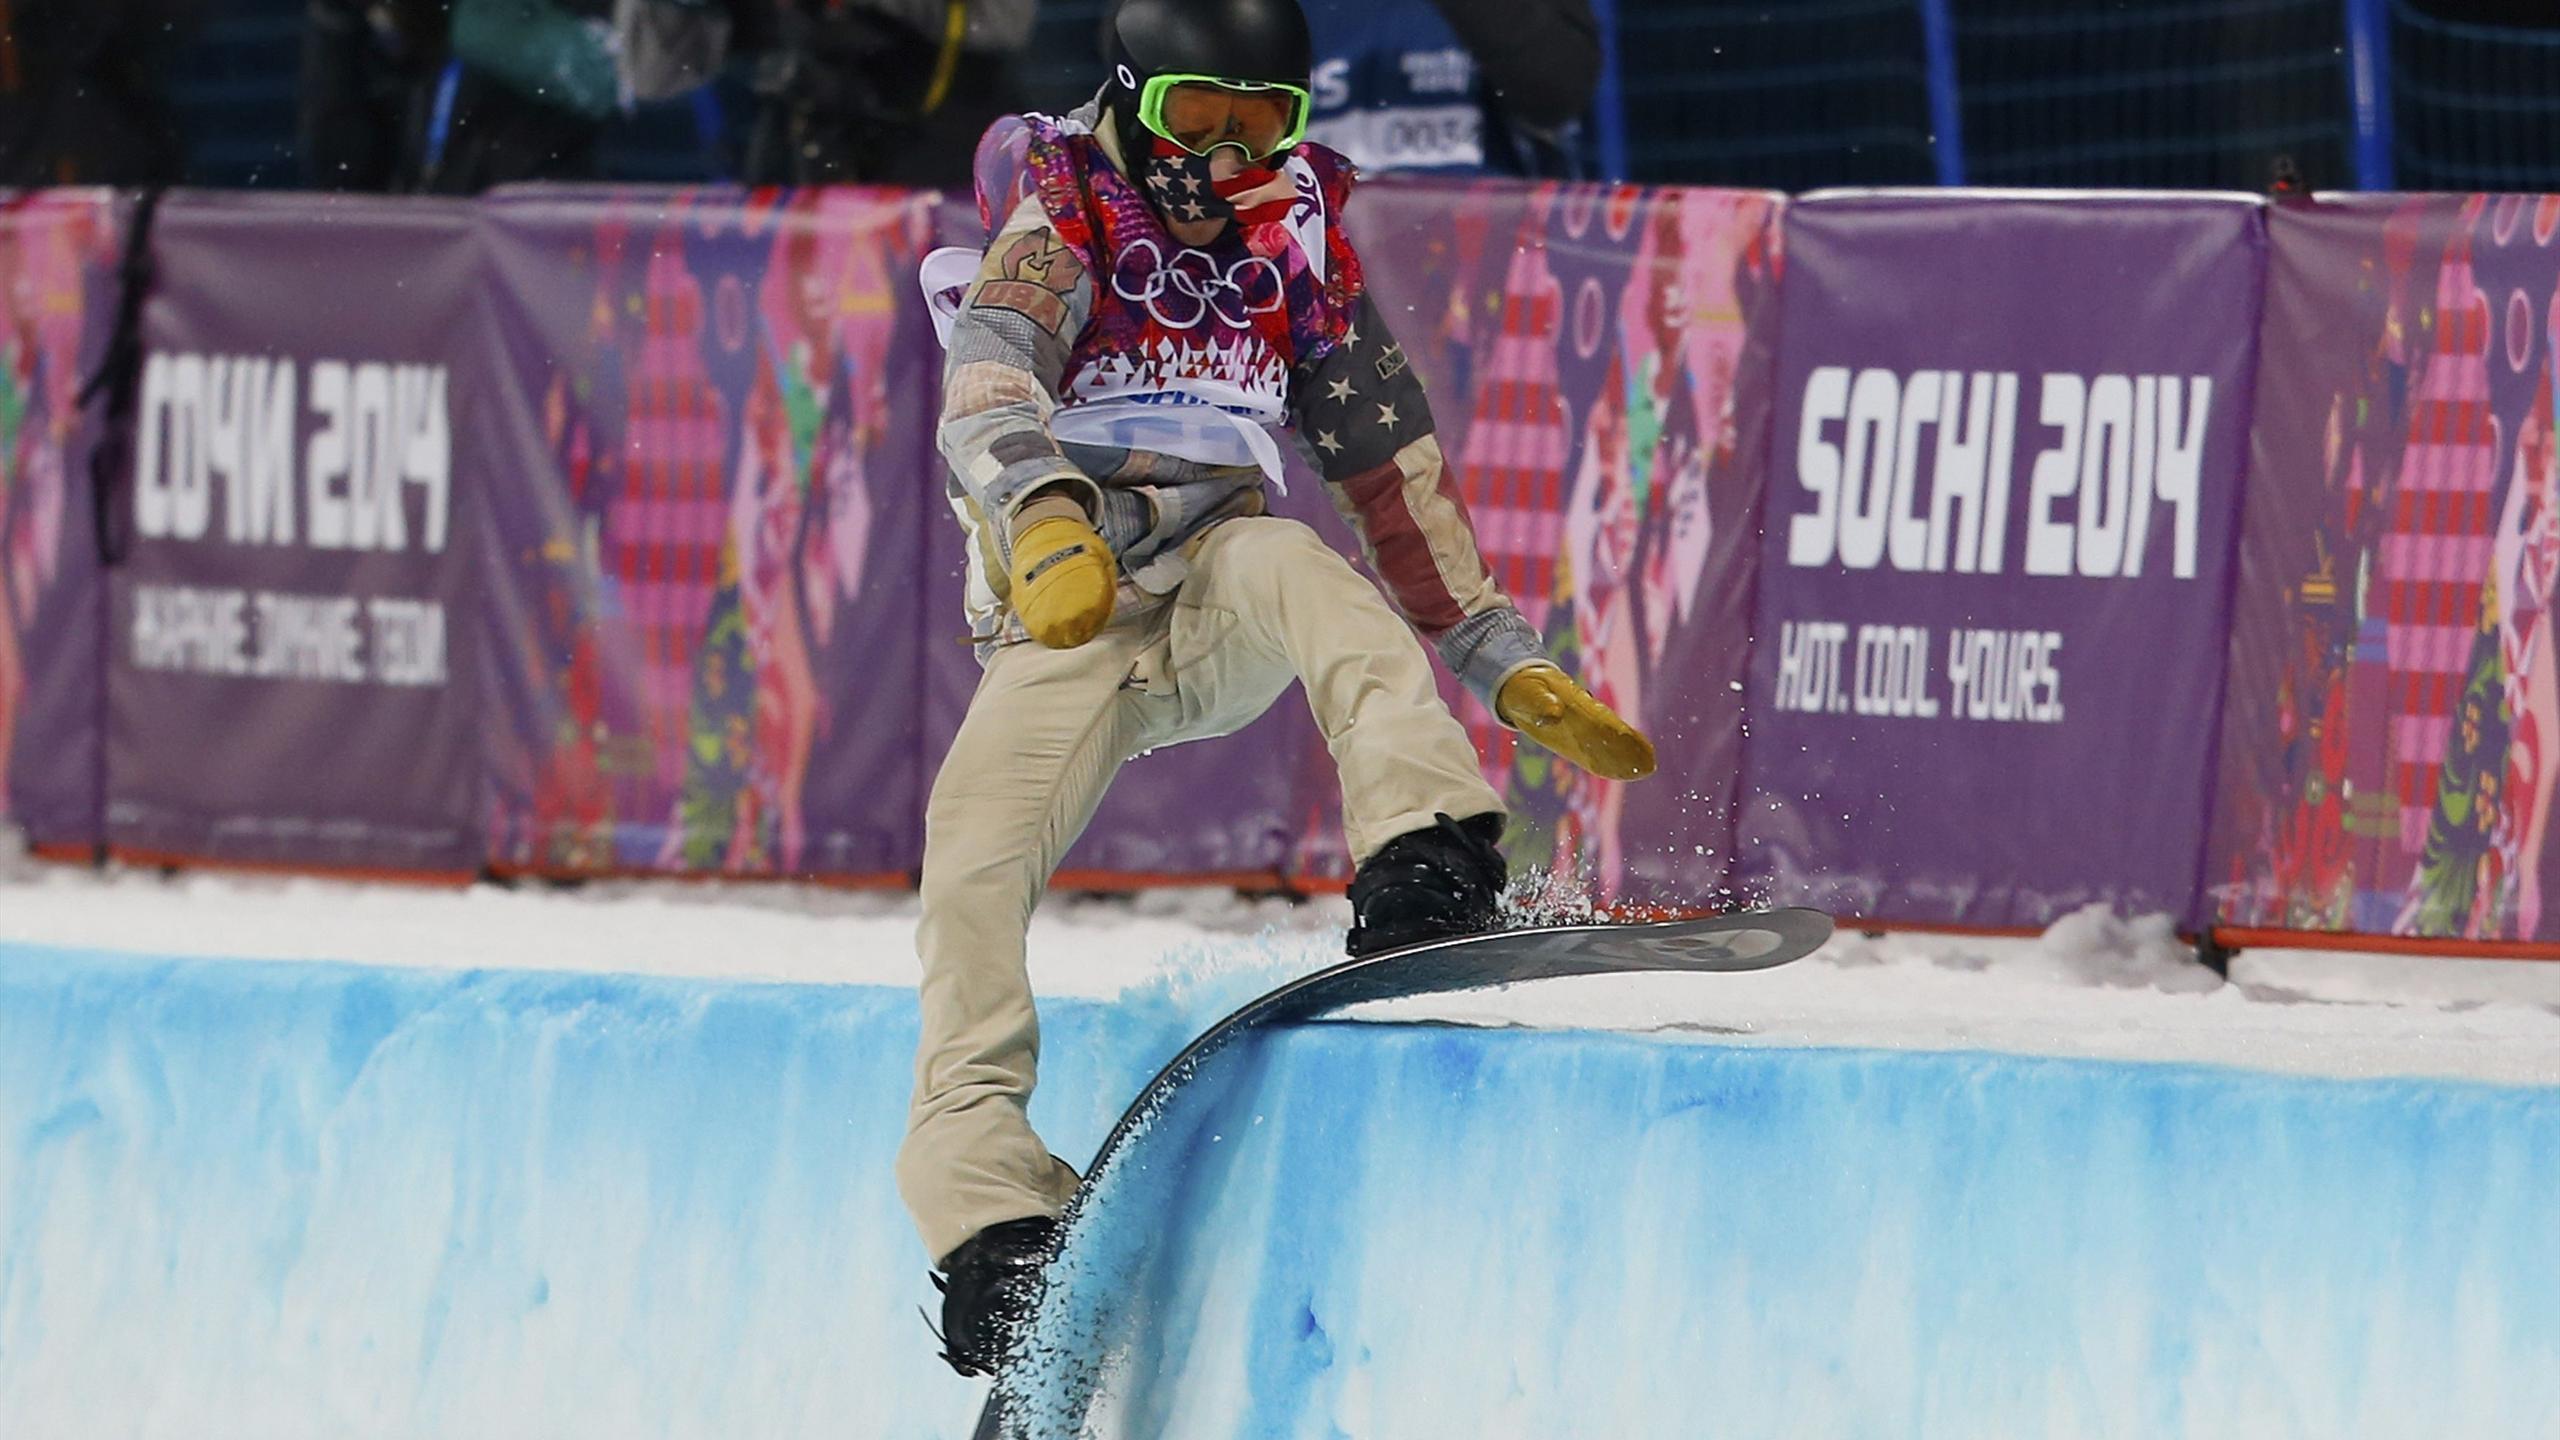 Сноуборд хафпайп олимпиада 8 фотография